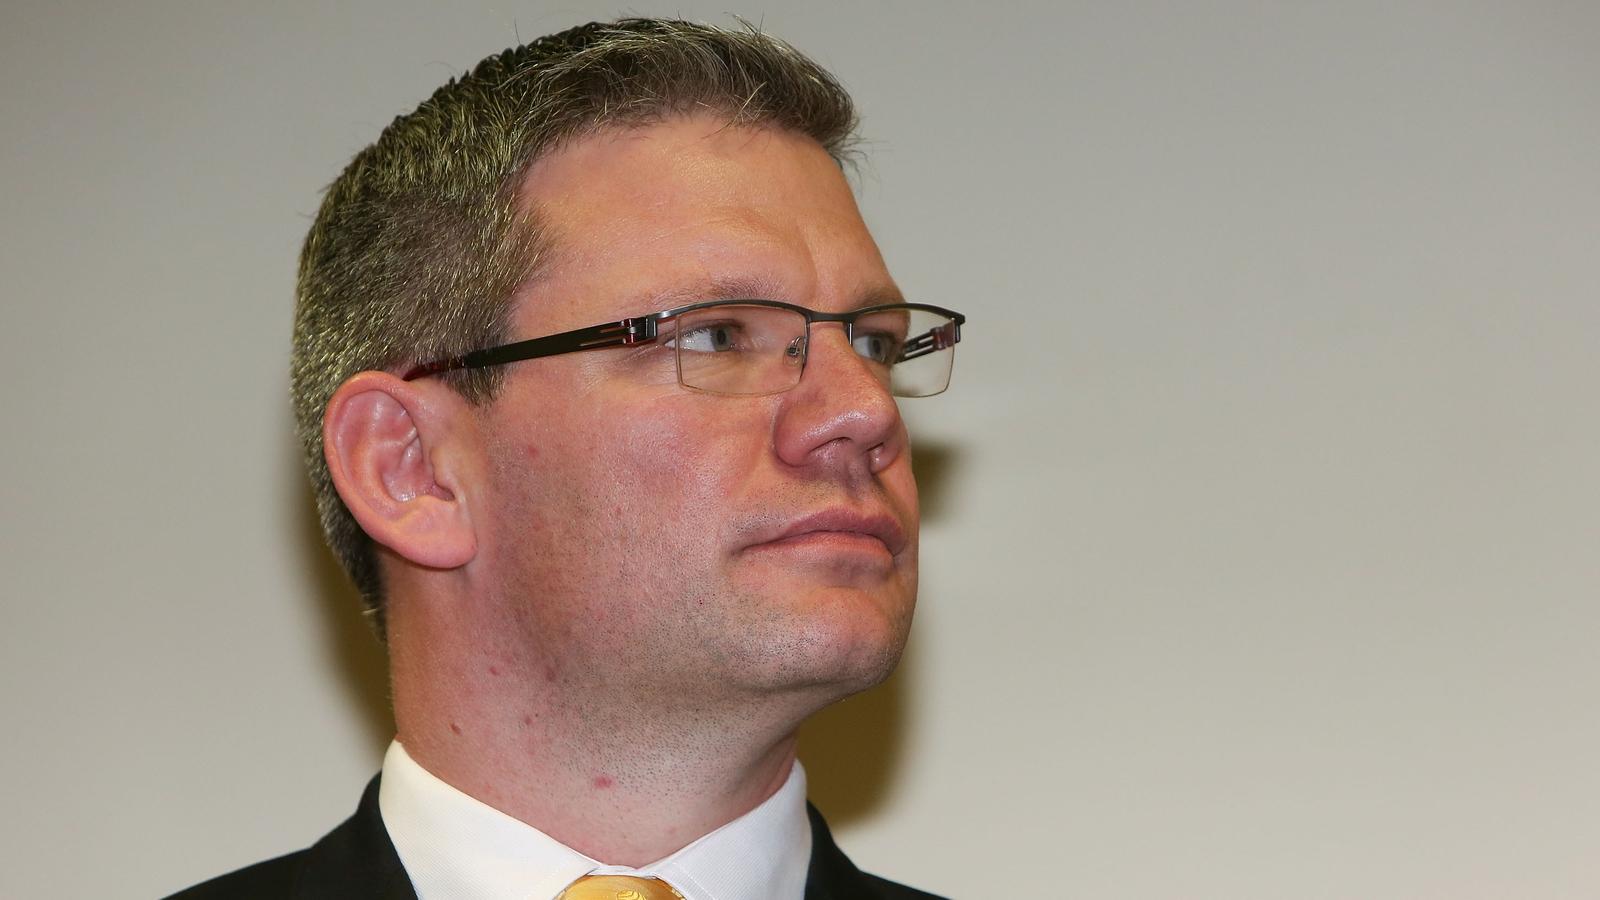 New Zealand bans zero-hour contracts